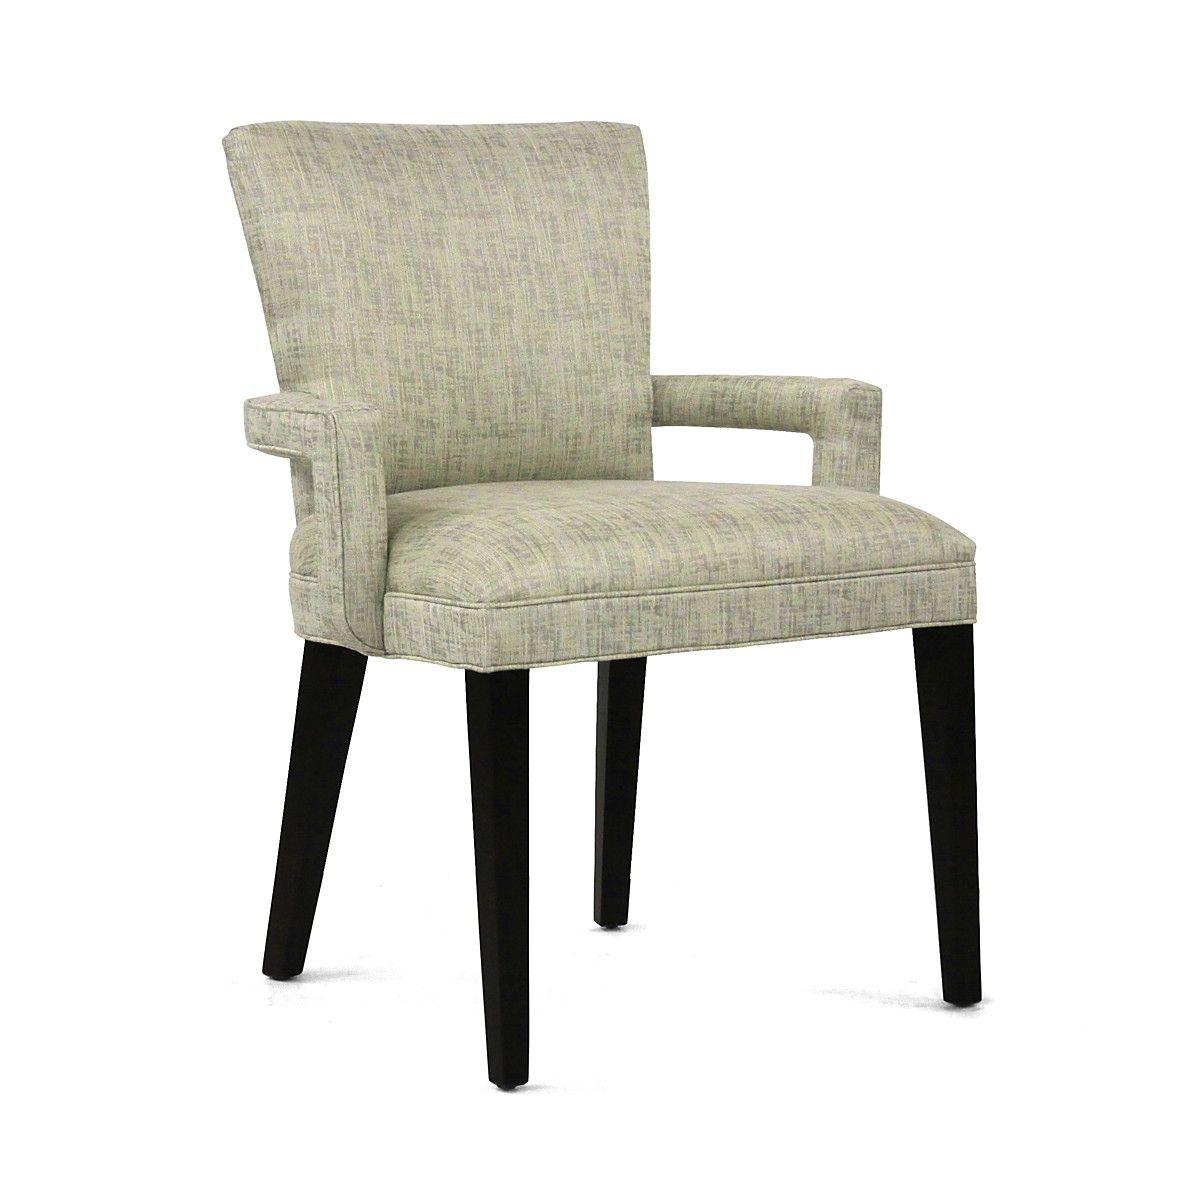 Mitchell Gold + Bob Williams Sydney Arm Chair | Church | Pinterest Inside Mitchell Arm Sofa Chairs (View 9 of 25)